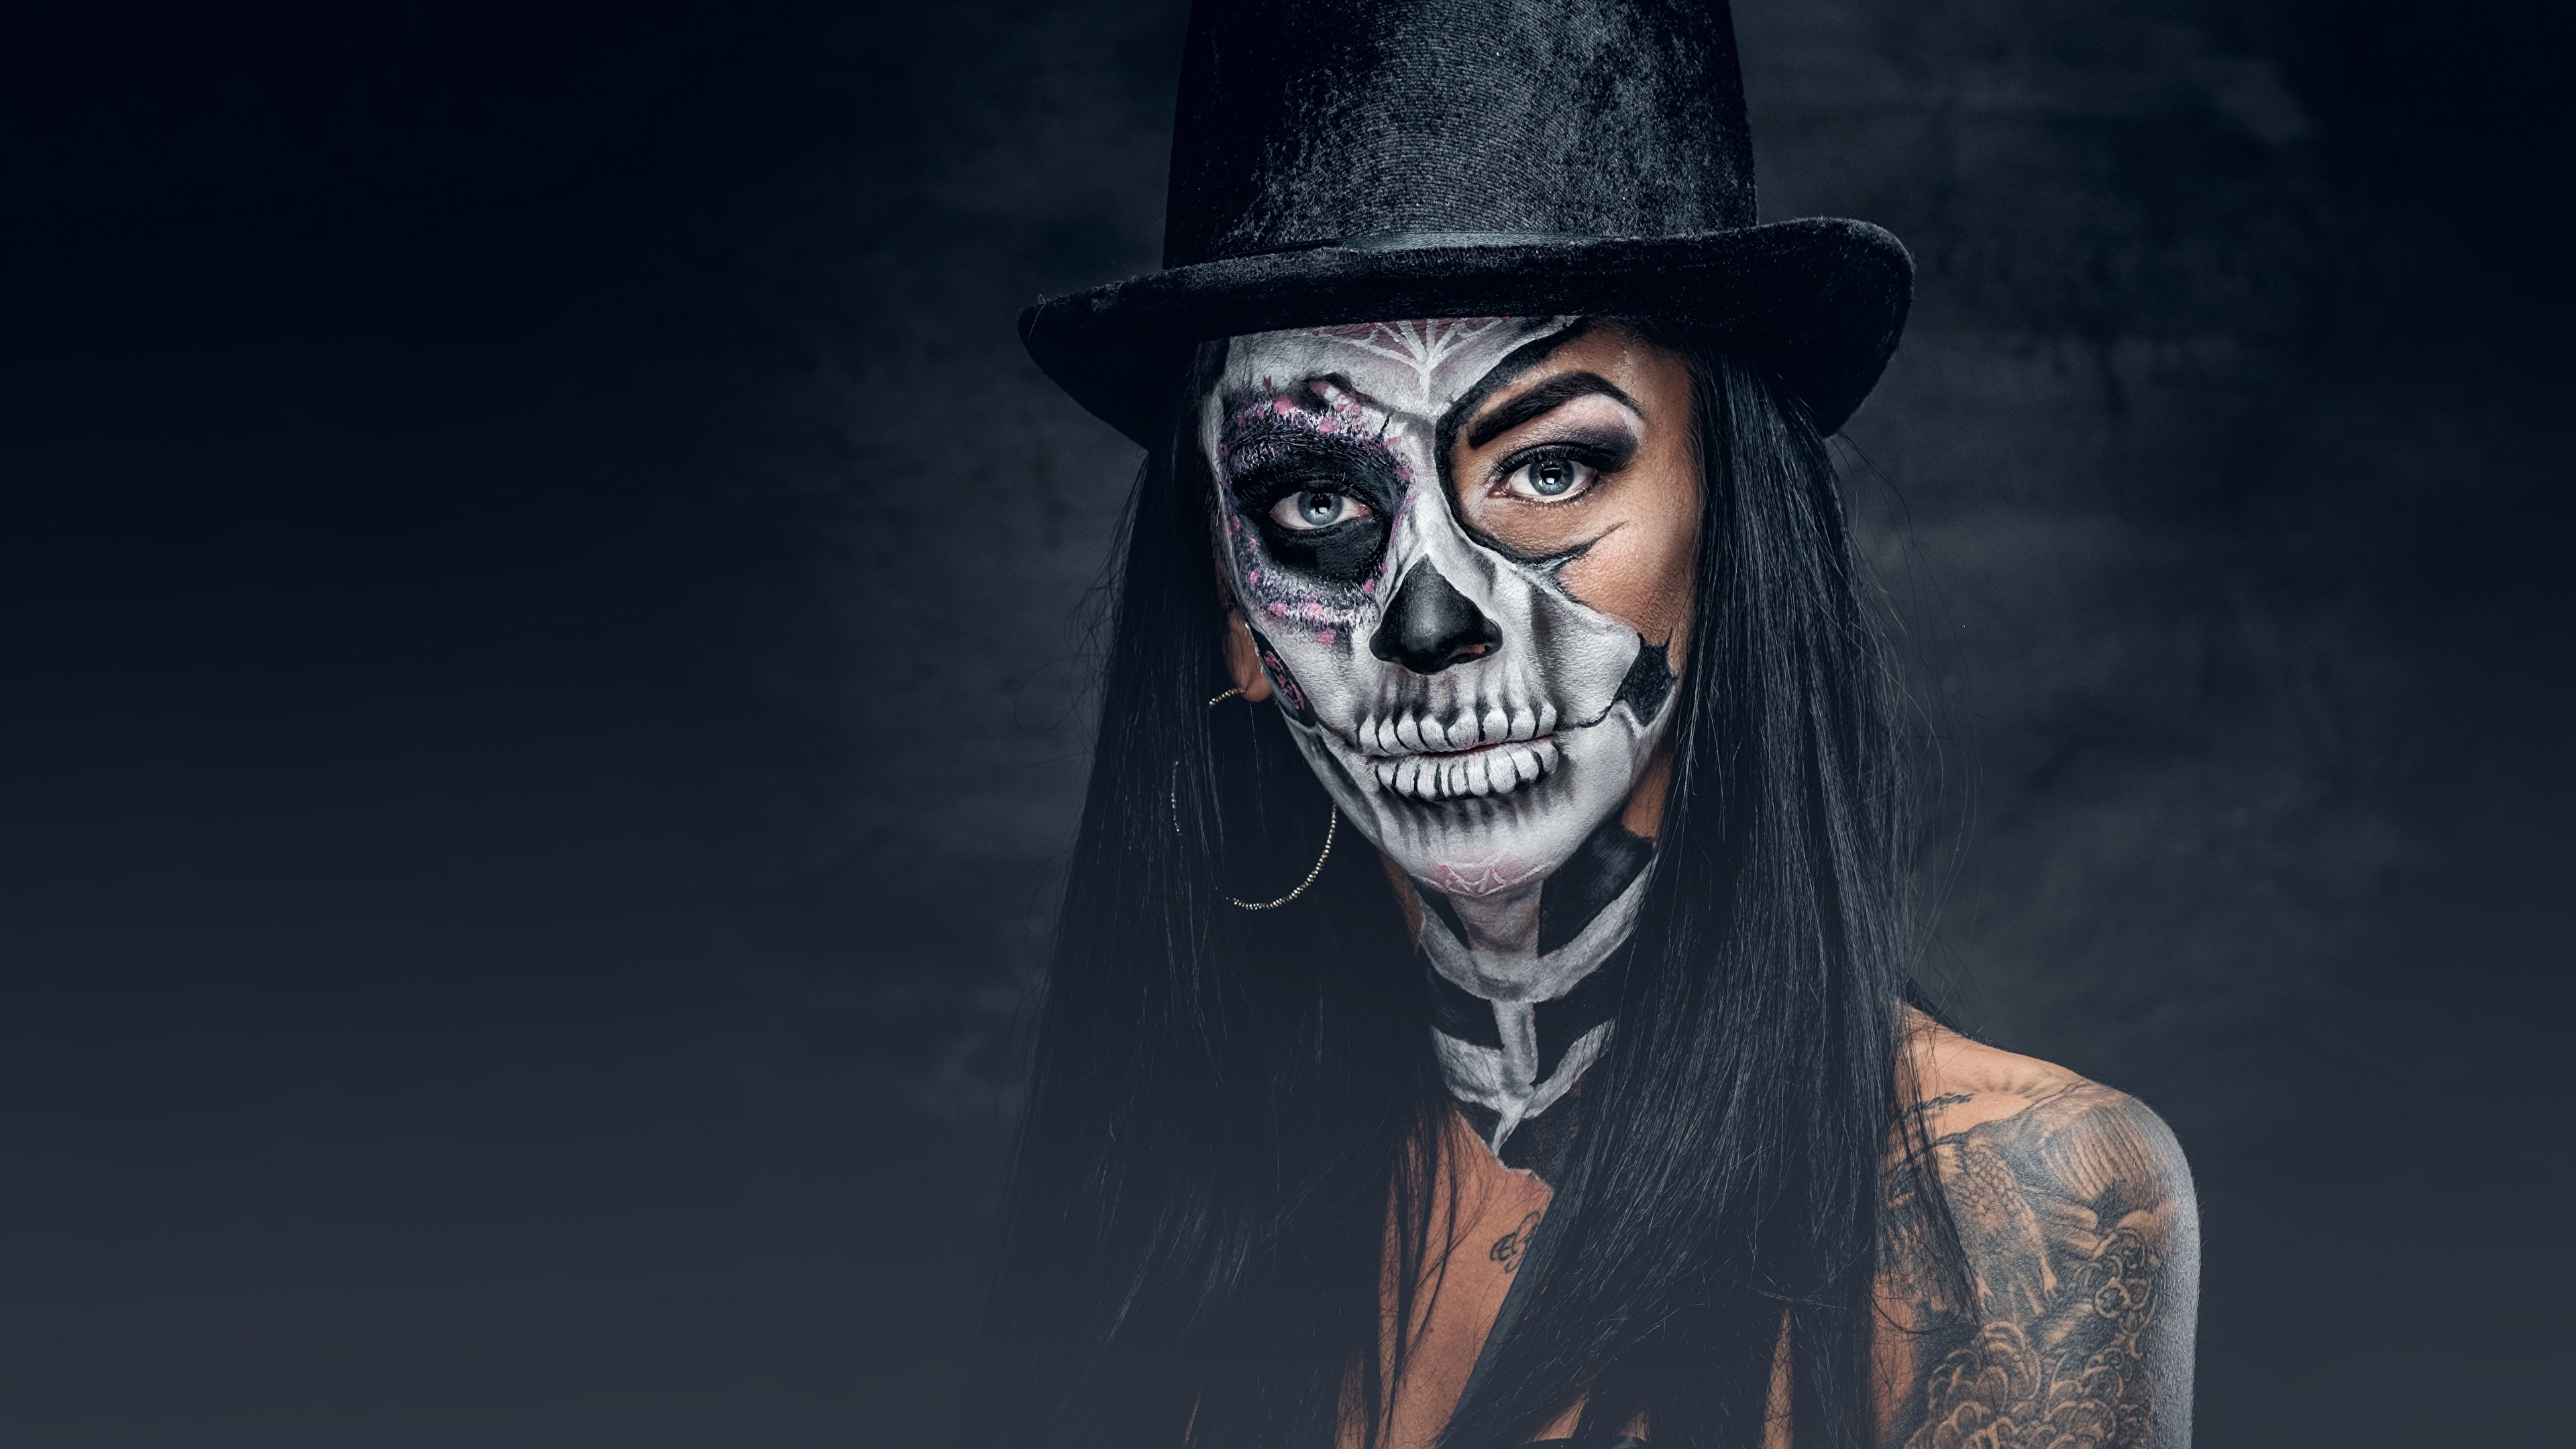 Images Brunette Girl Makeup Day Of The Dead Hat Girls 3840x2160